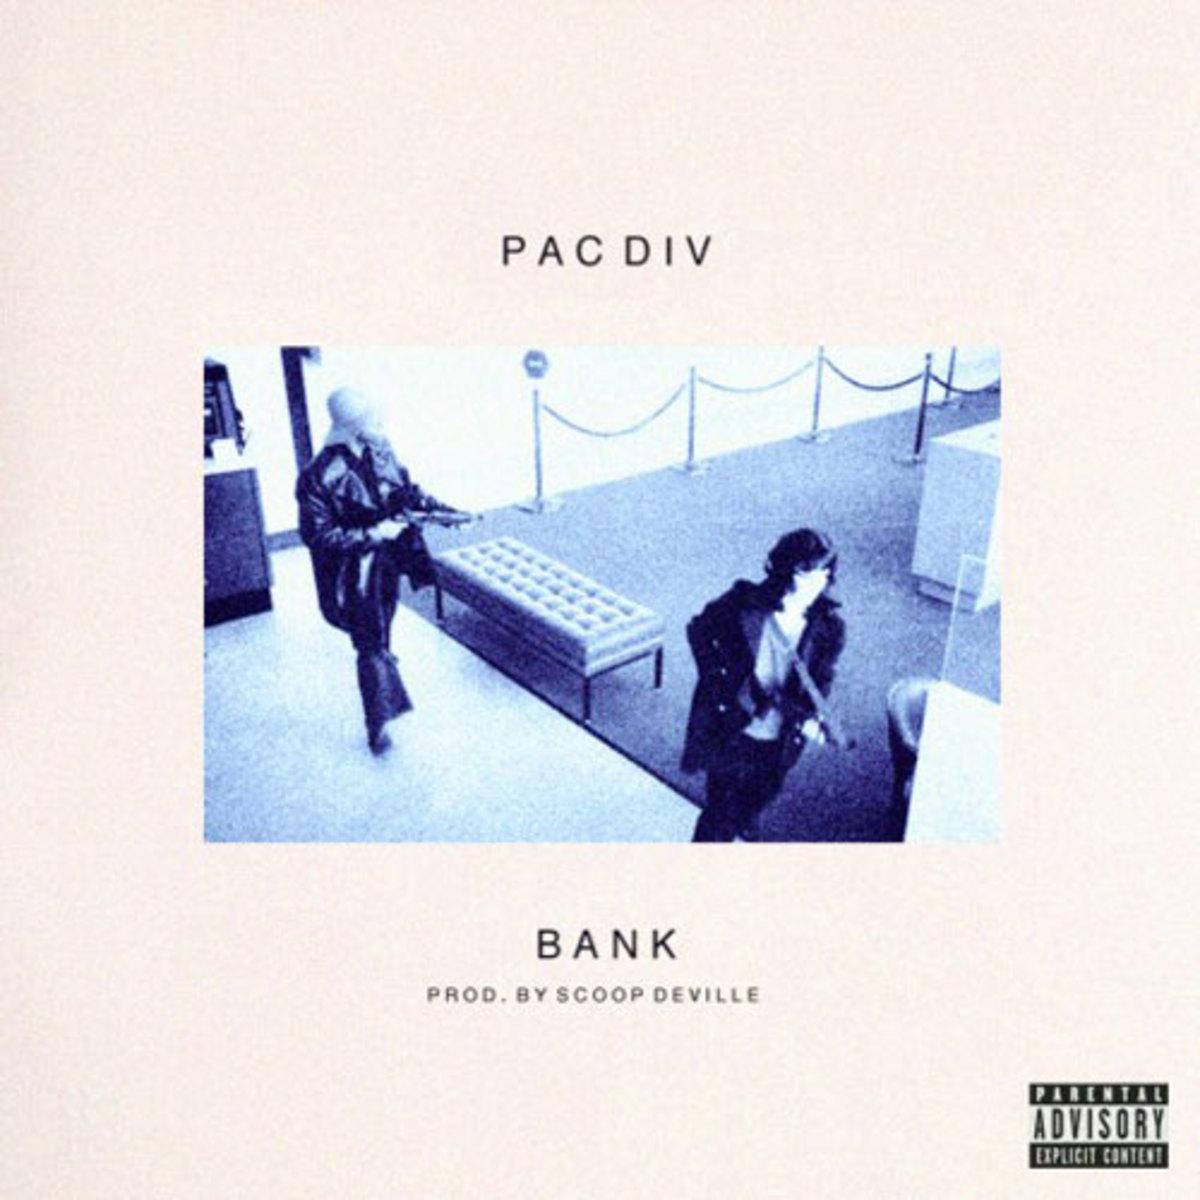 pacdiv-bank.jpg